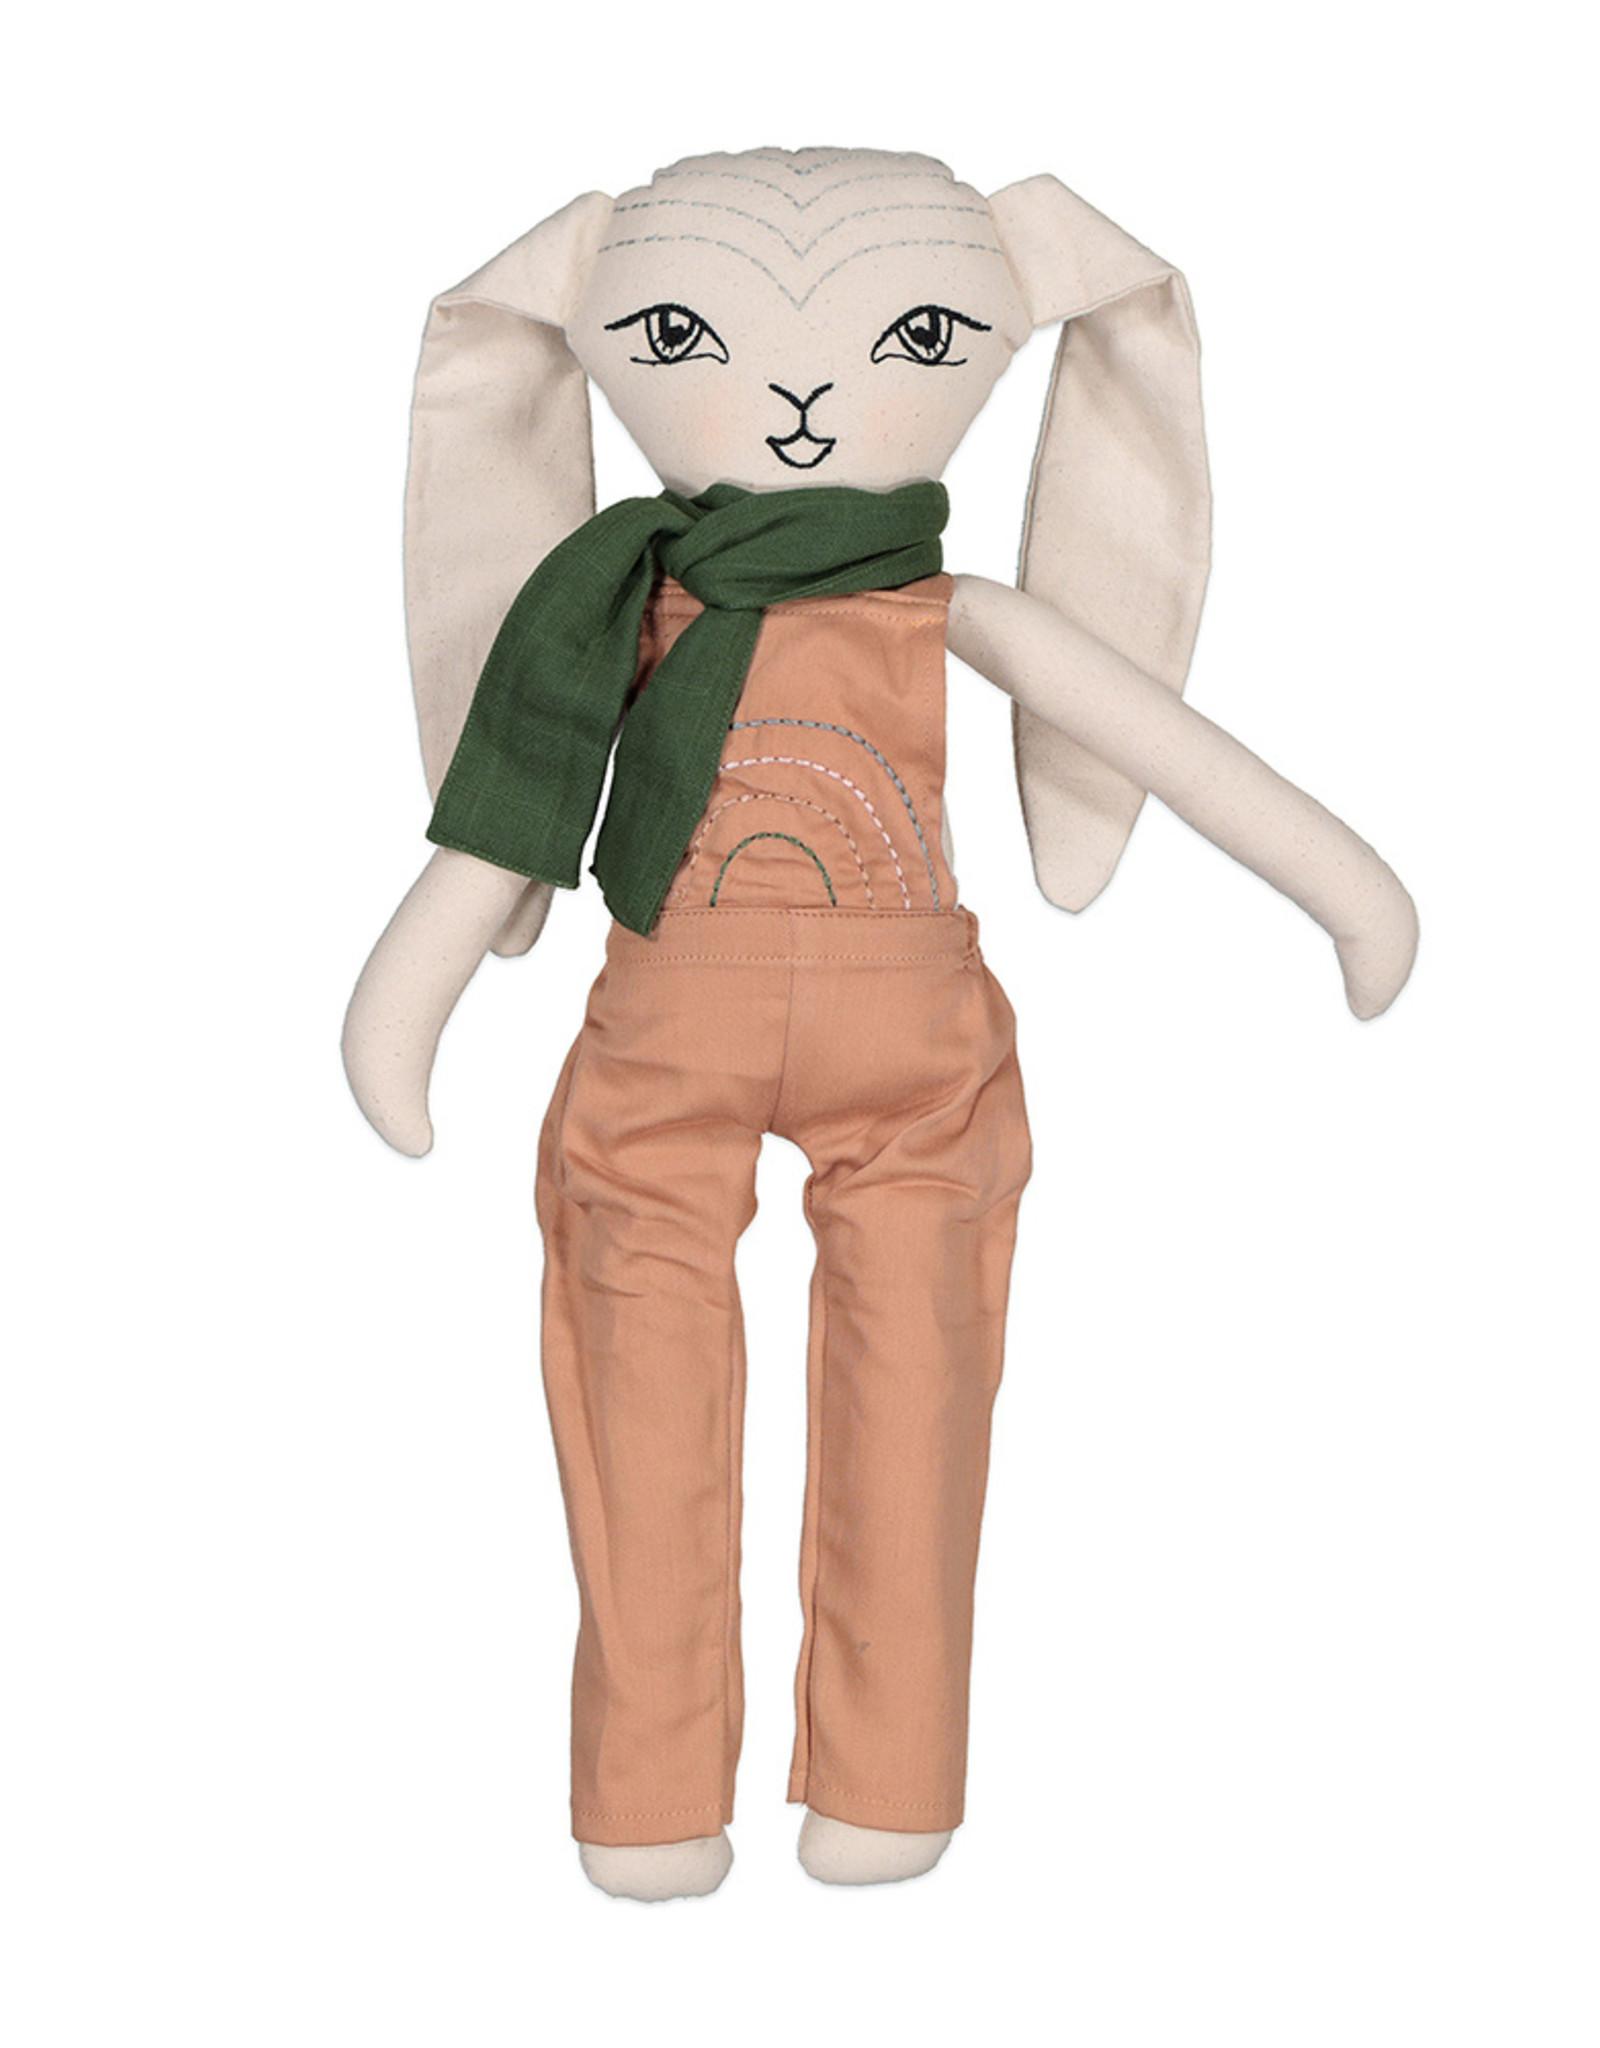 Burrow & Be Burrow & Be - Bunny Doll Winslow